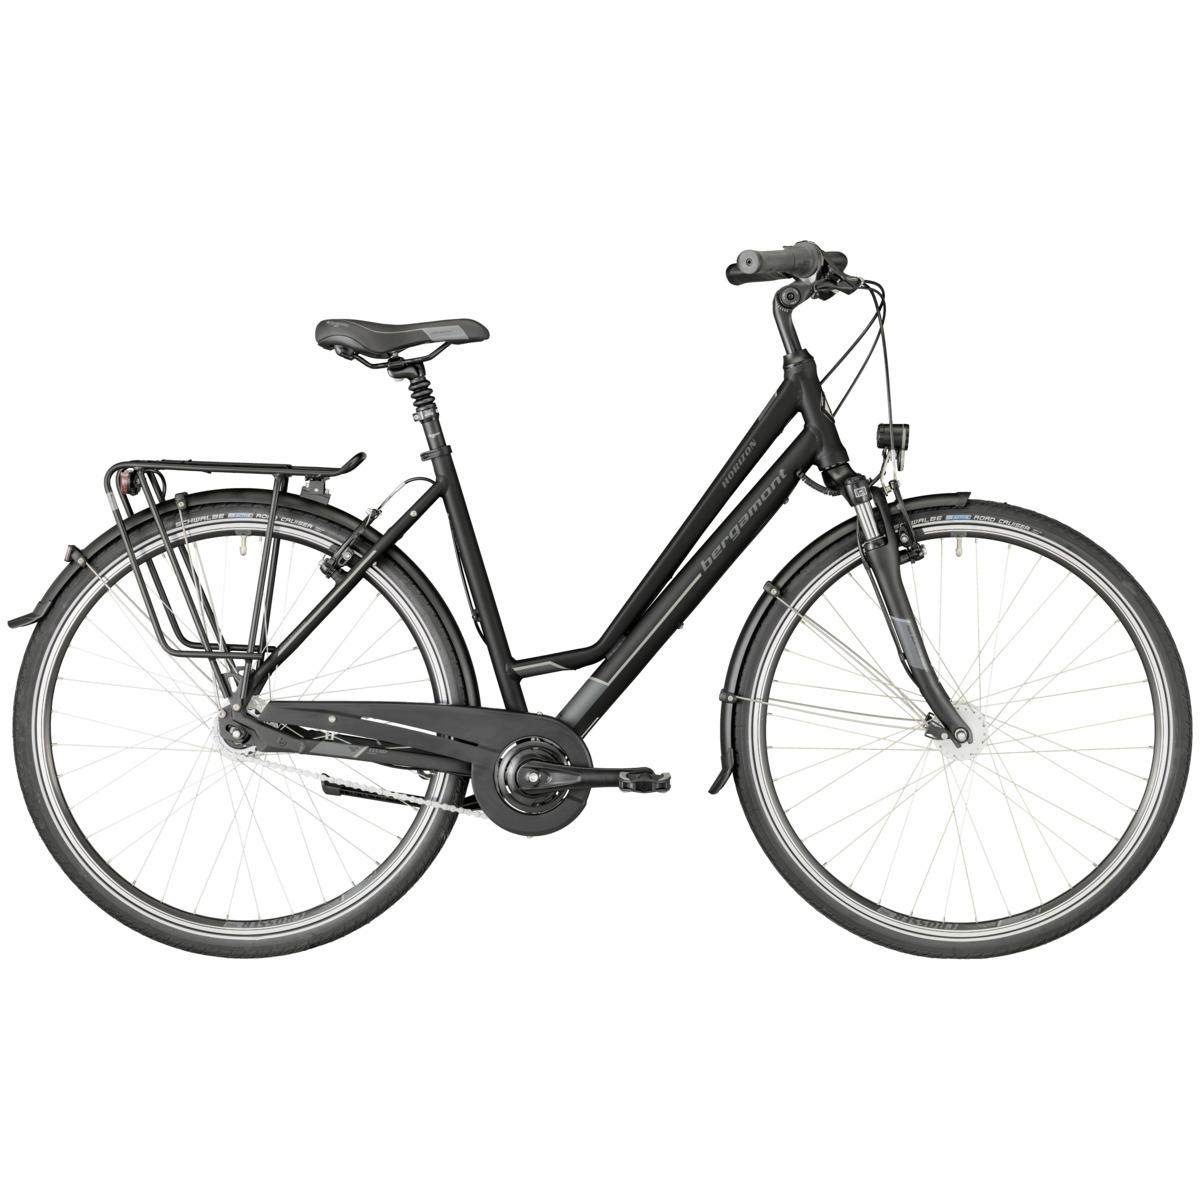 bergamont horizon n7 fh amsterdam damen trekking fahrrad. Black Bedroom Furniture Sets. Home Design Ideas